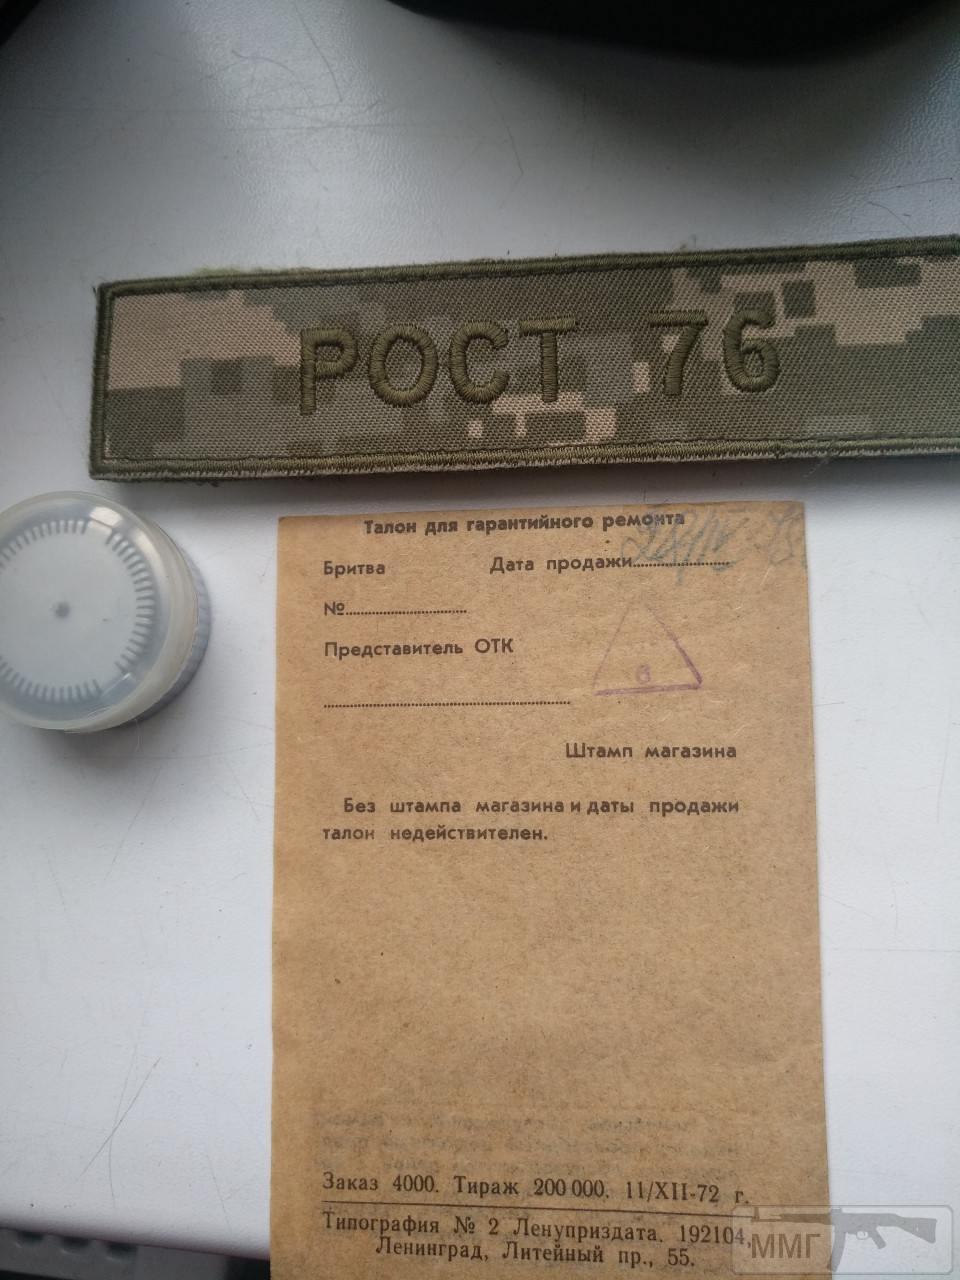 87771 - Механічна бритва ,,Спутник,,